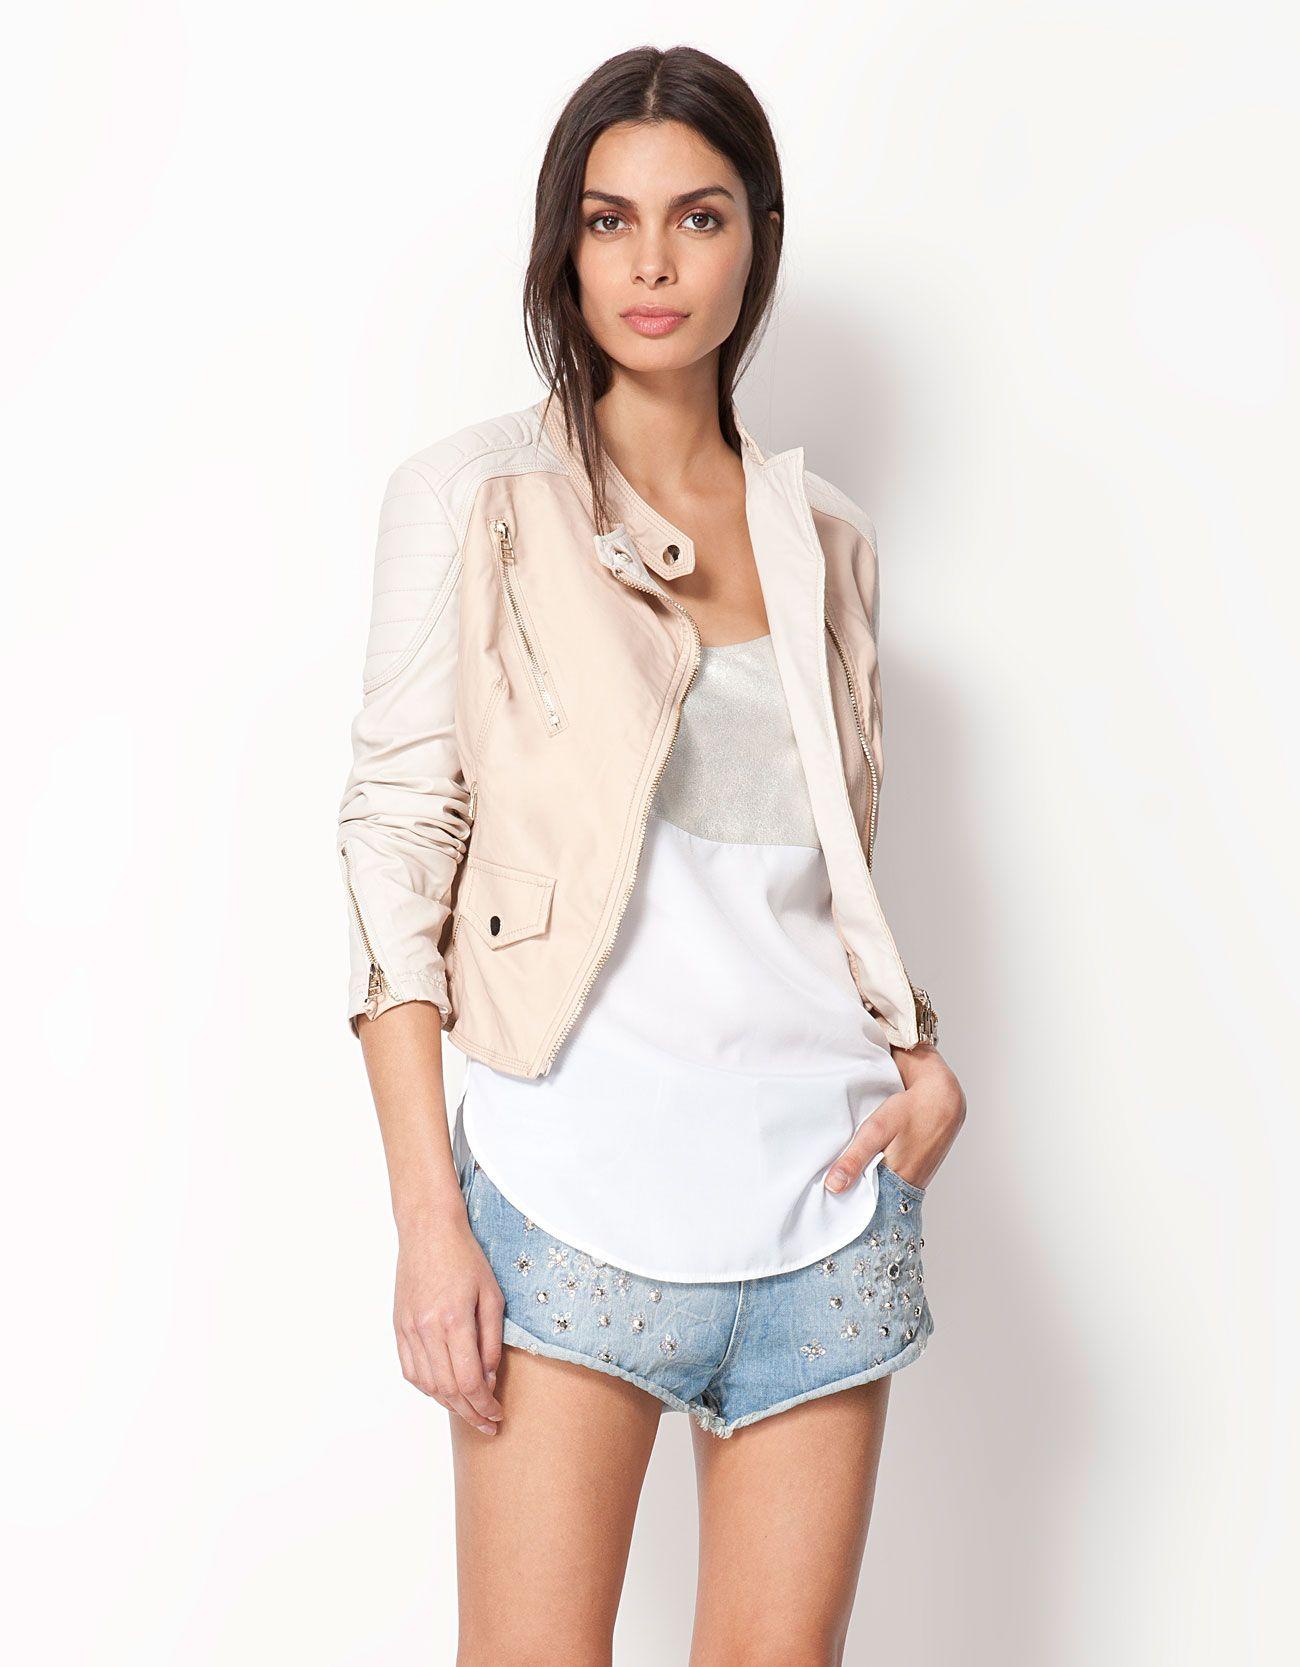 a62b9f3768 Bershka Azerbaijan - Bershka imitation leather jacket   style ...